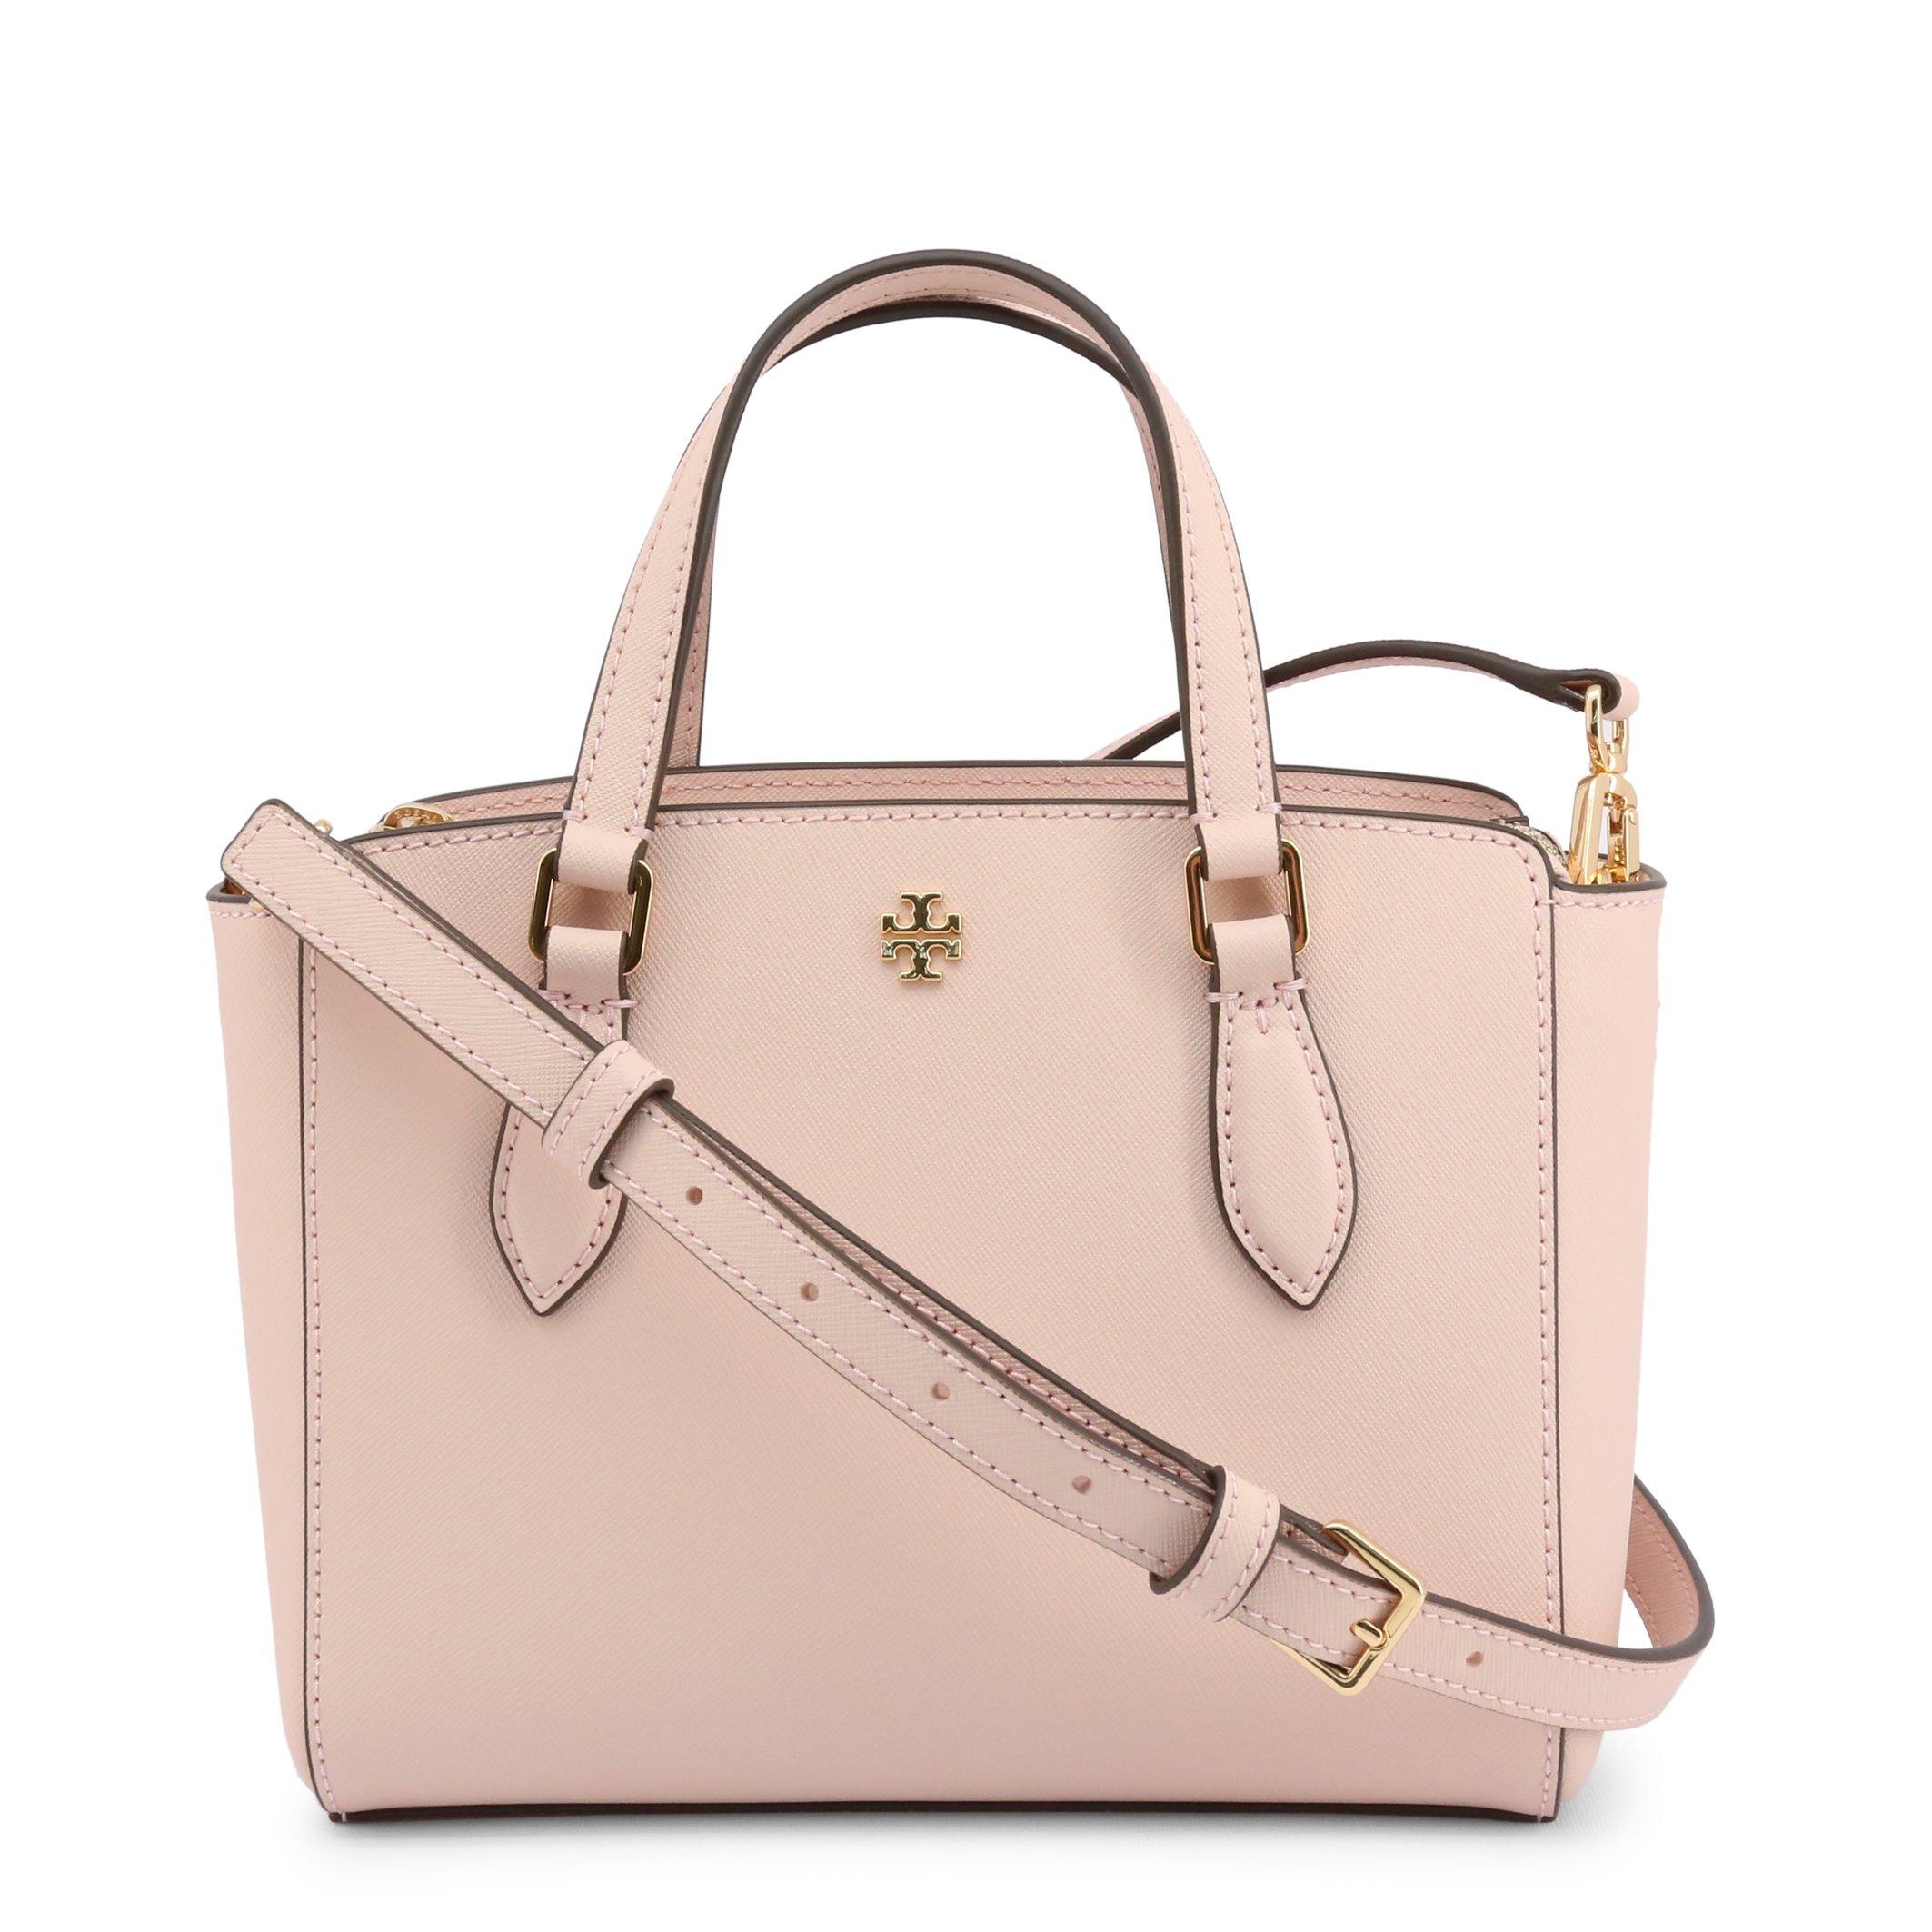 Tory Burch Women's Handbag Various Colours 64189 - pink NOSIZE